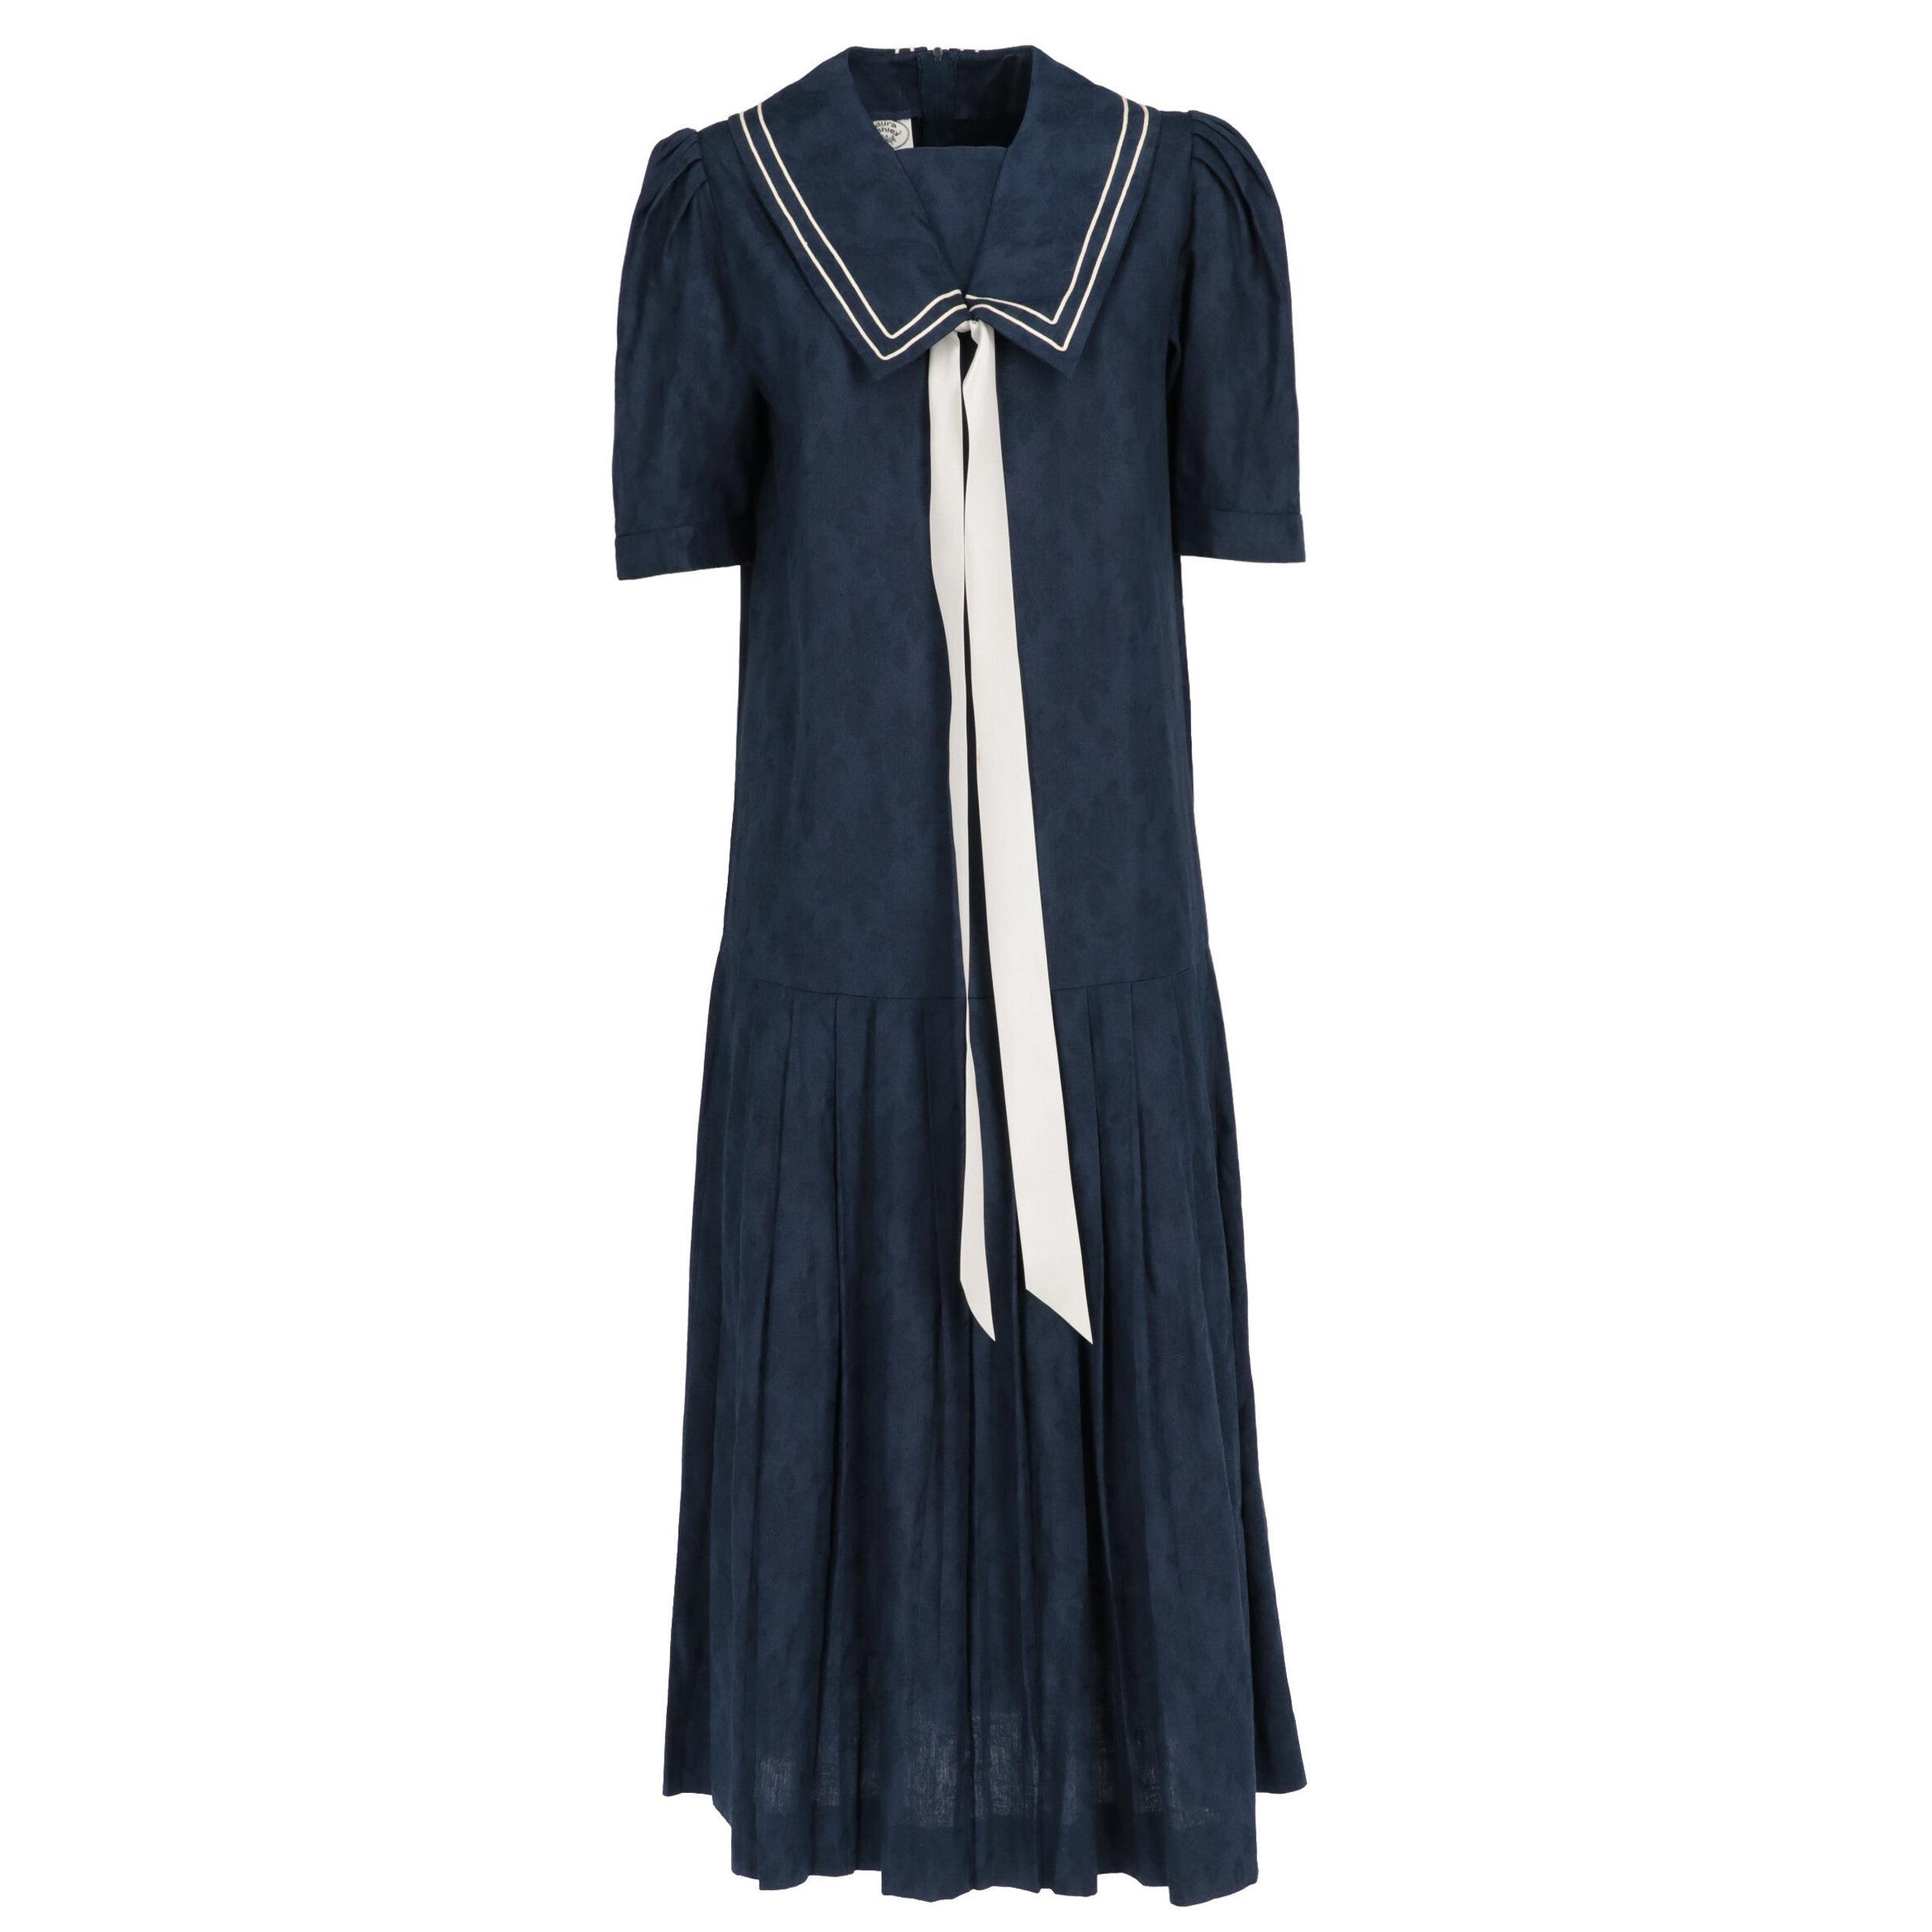 1980s Laura Ashley Blue Dress